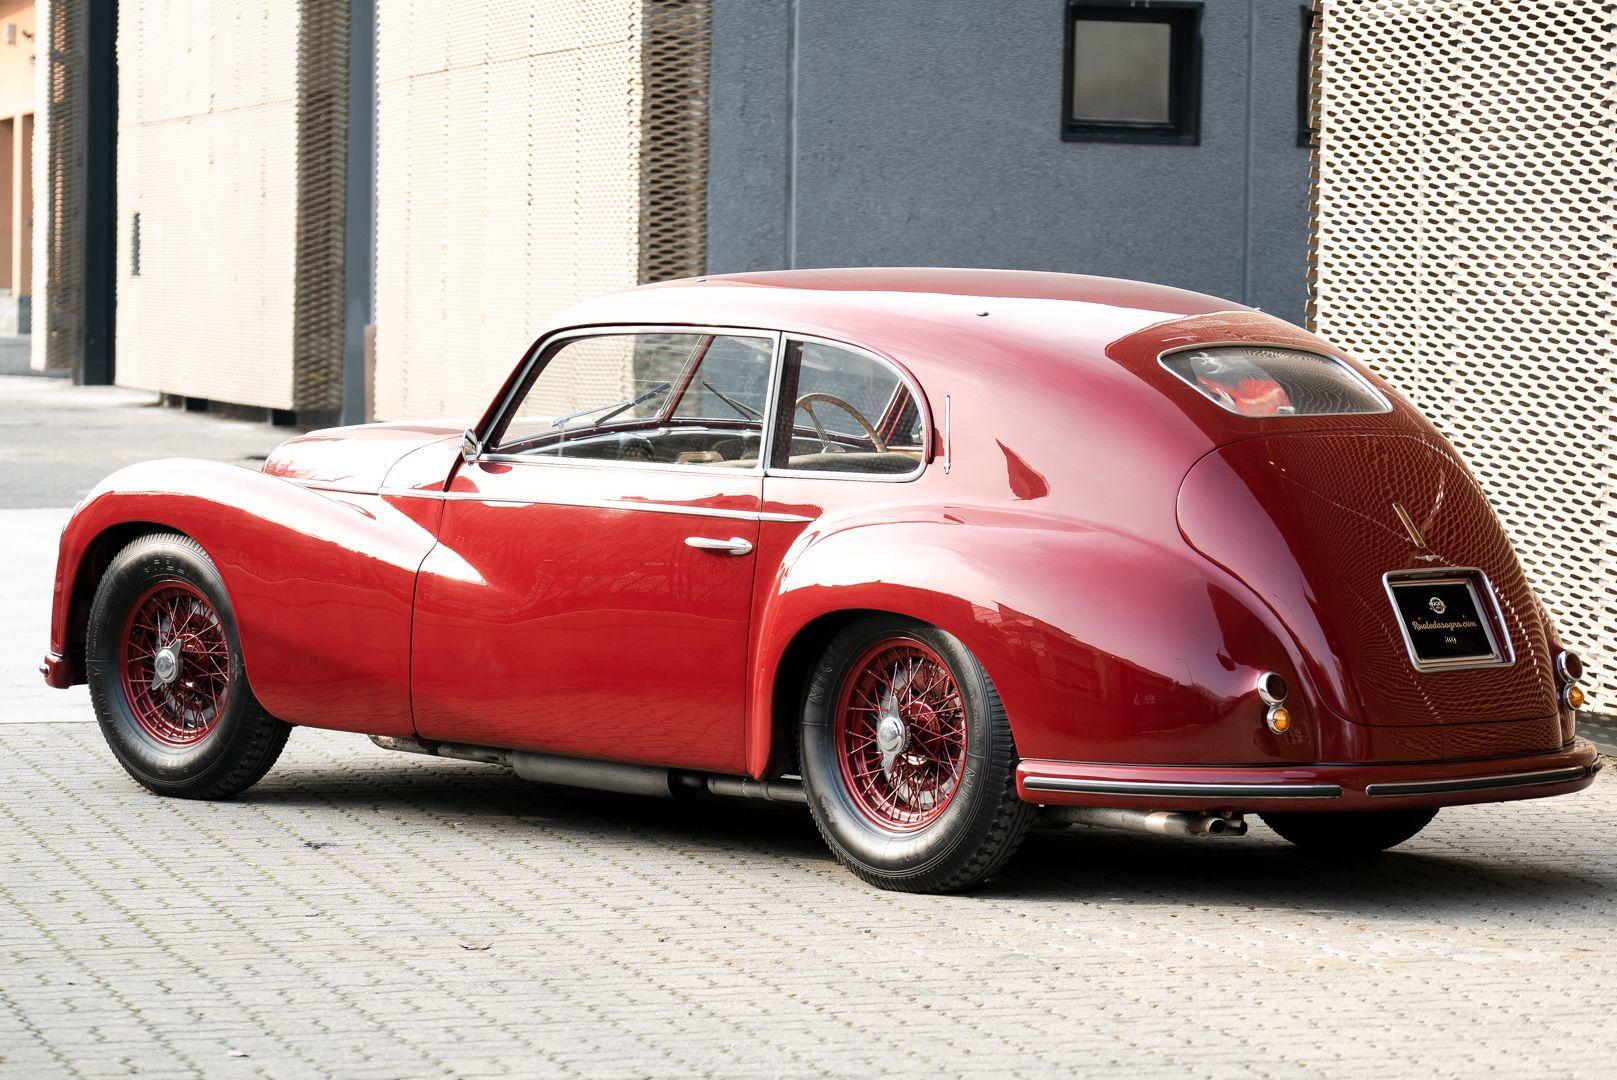 1947 Alfa Romeo Freccia d'oro 6C 2500 Sport 61679